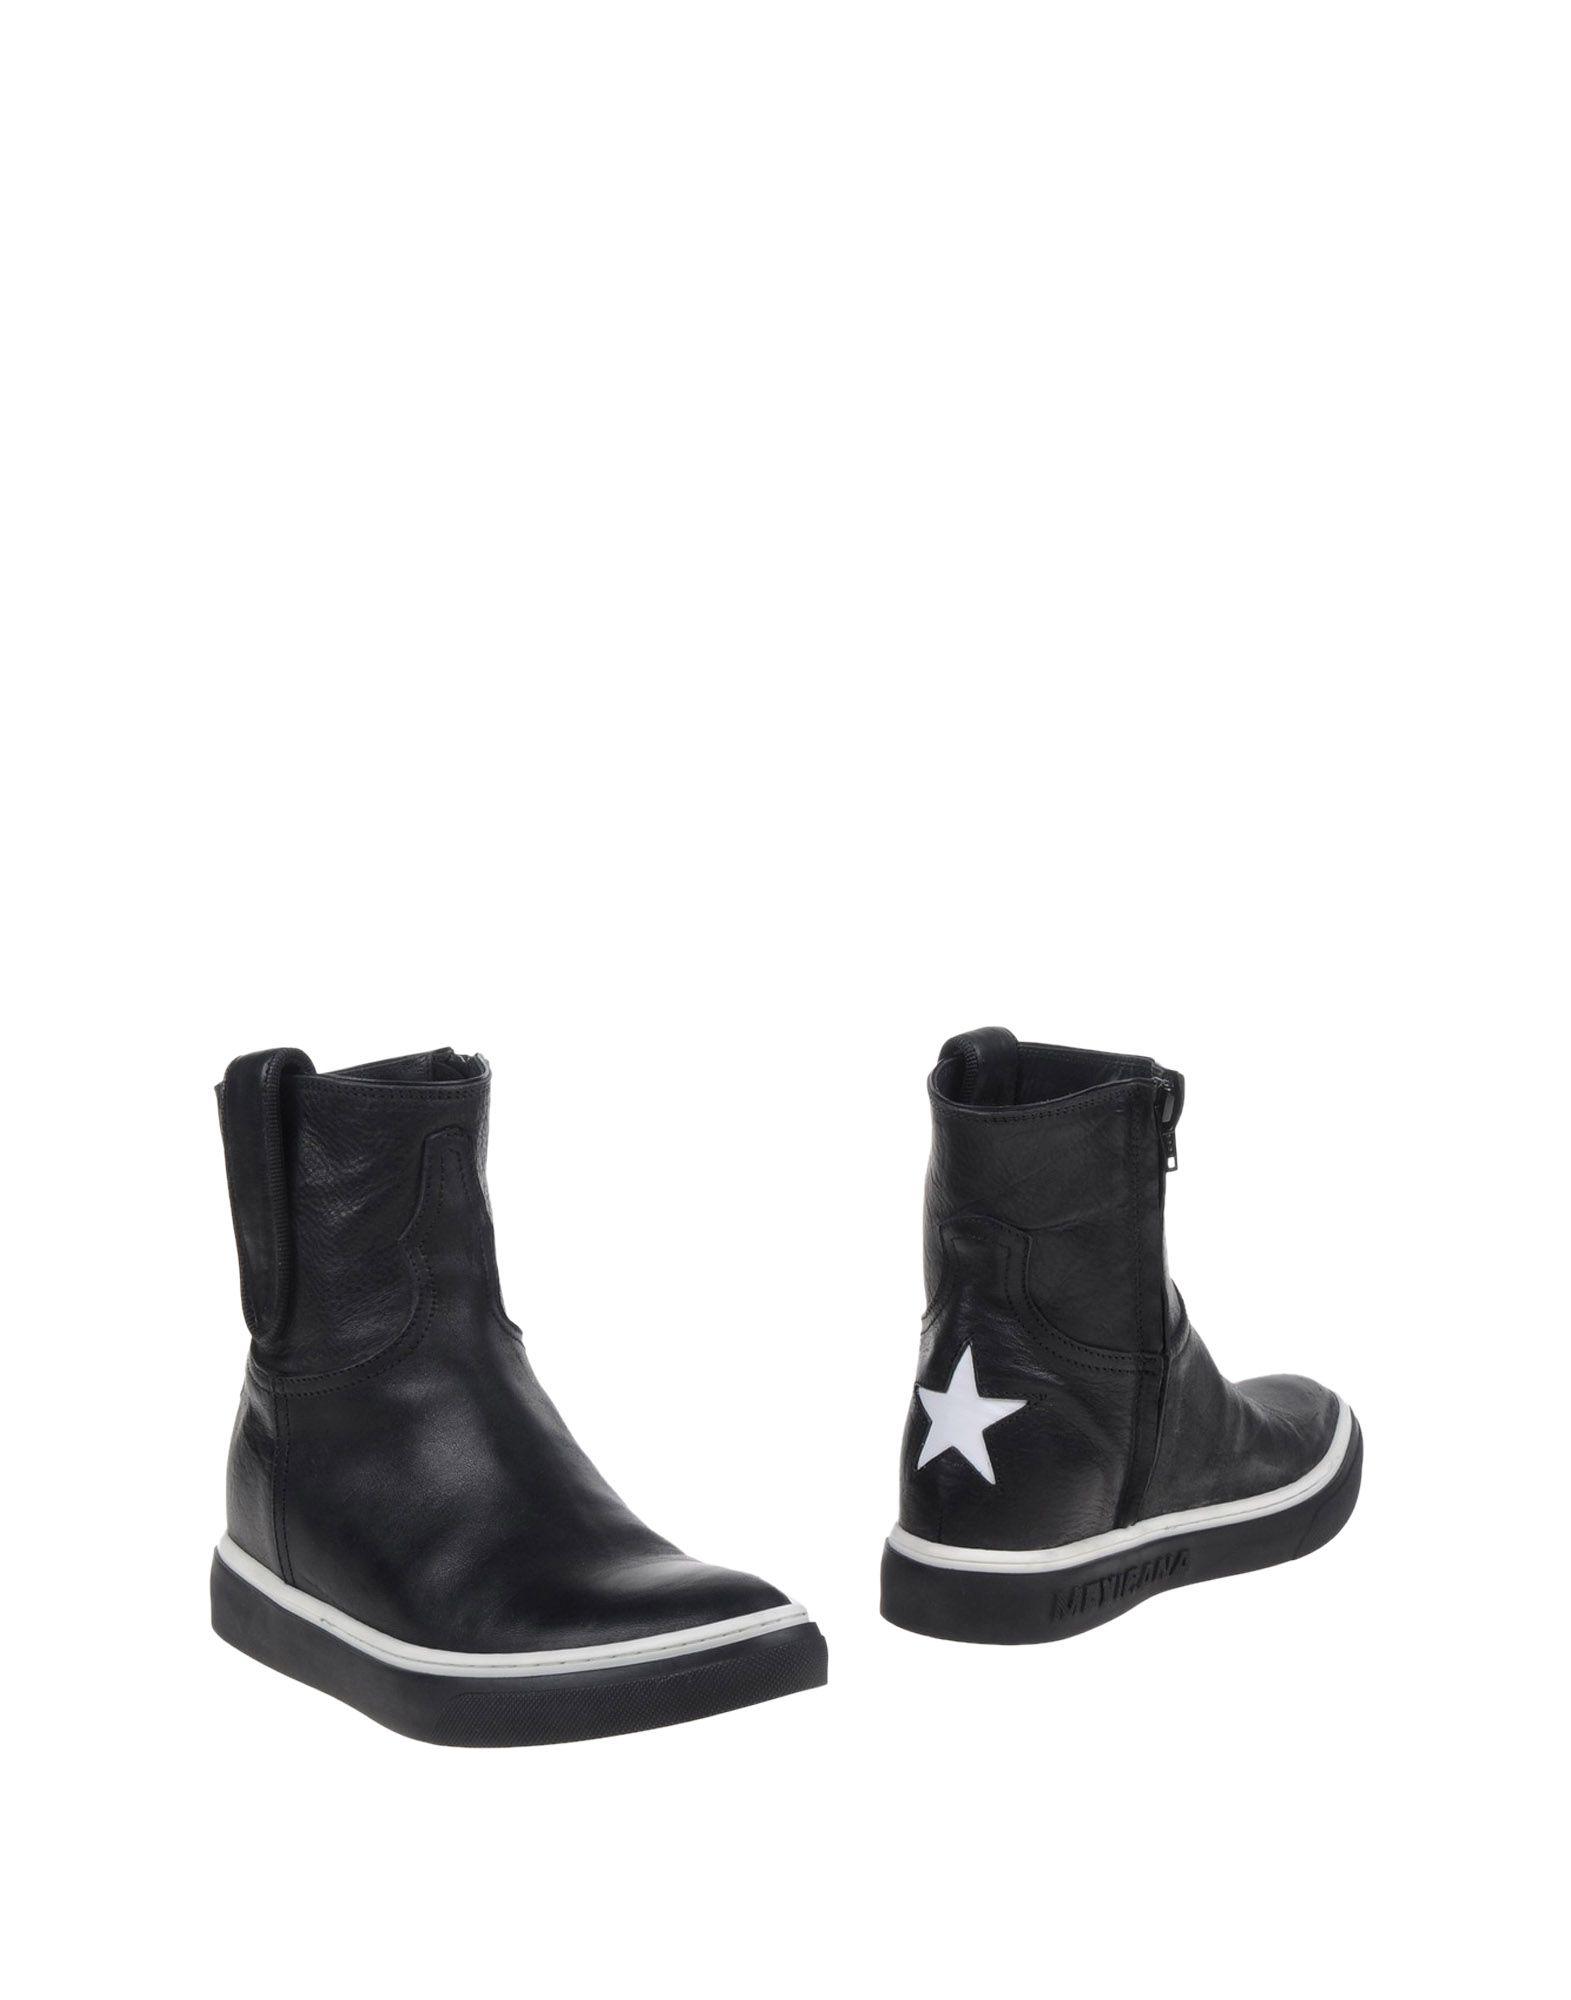 FOOTWEAR - Ankle boots on YOOX.COM Mexicana ERoFBbxUC